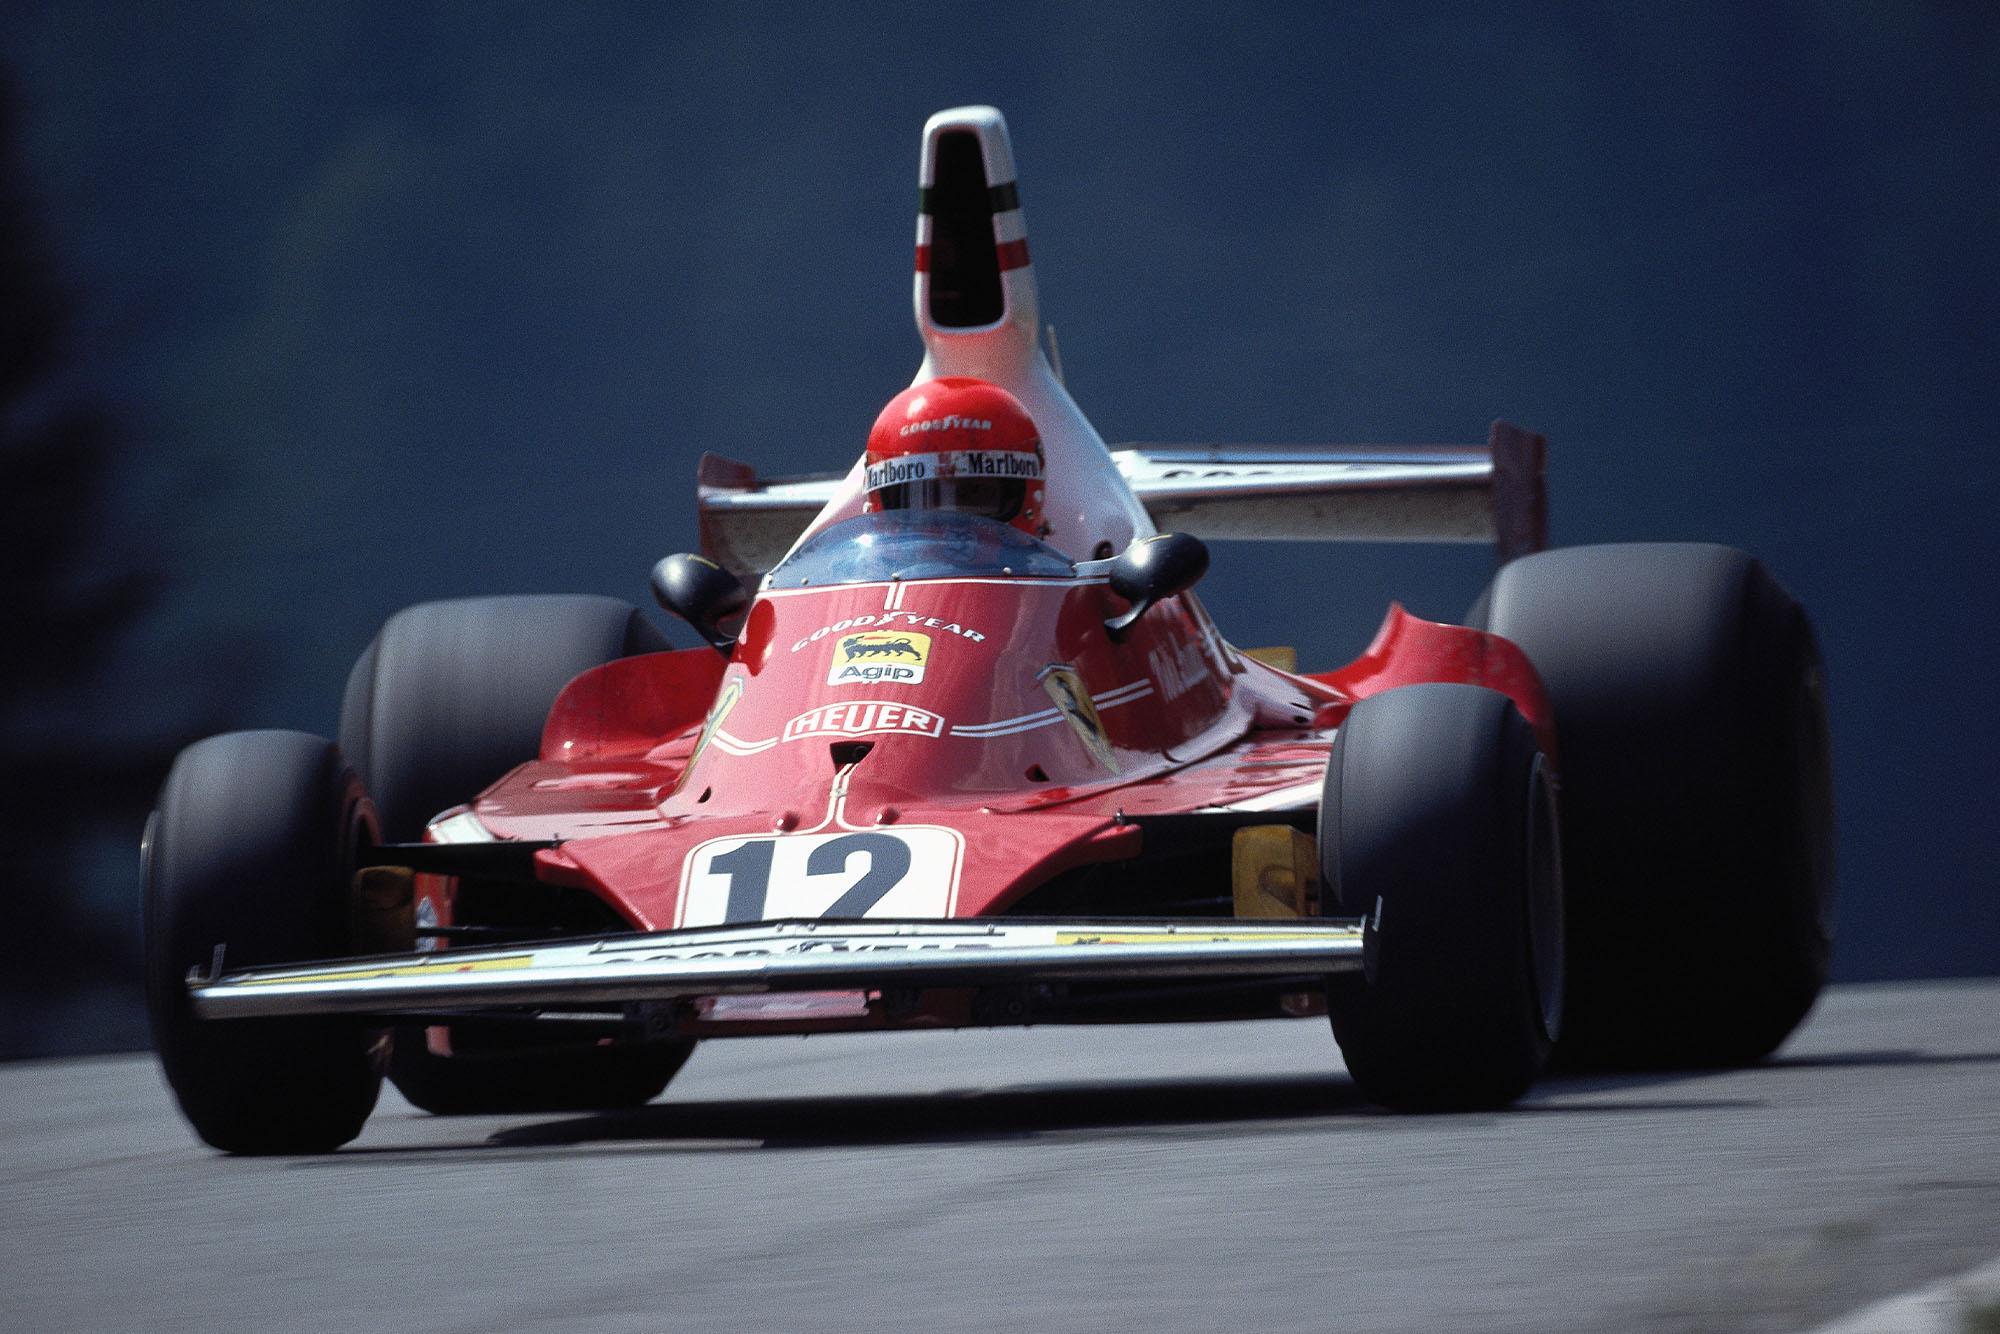 Niki Lauda in his Ferrari at the 1975 Austrian Grand Prix, Osterreichring.